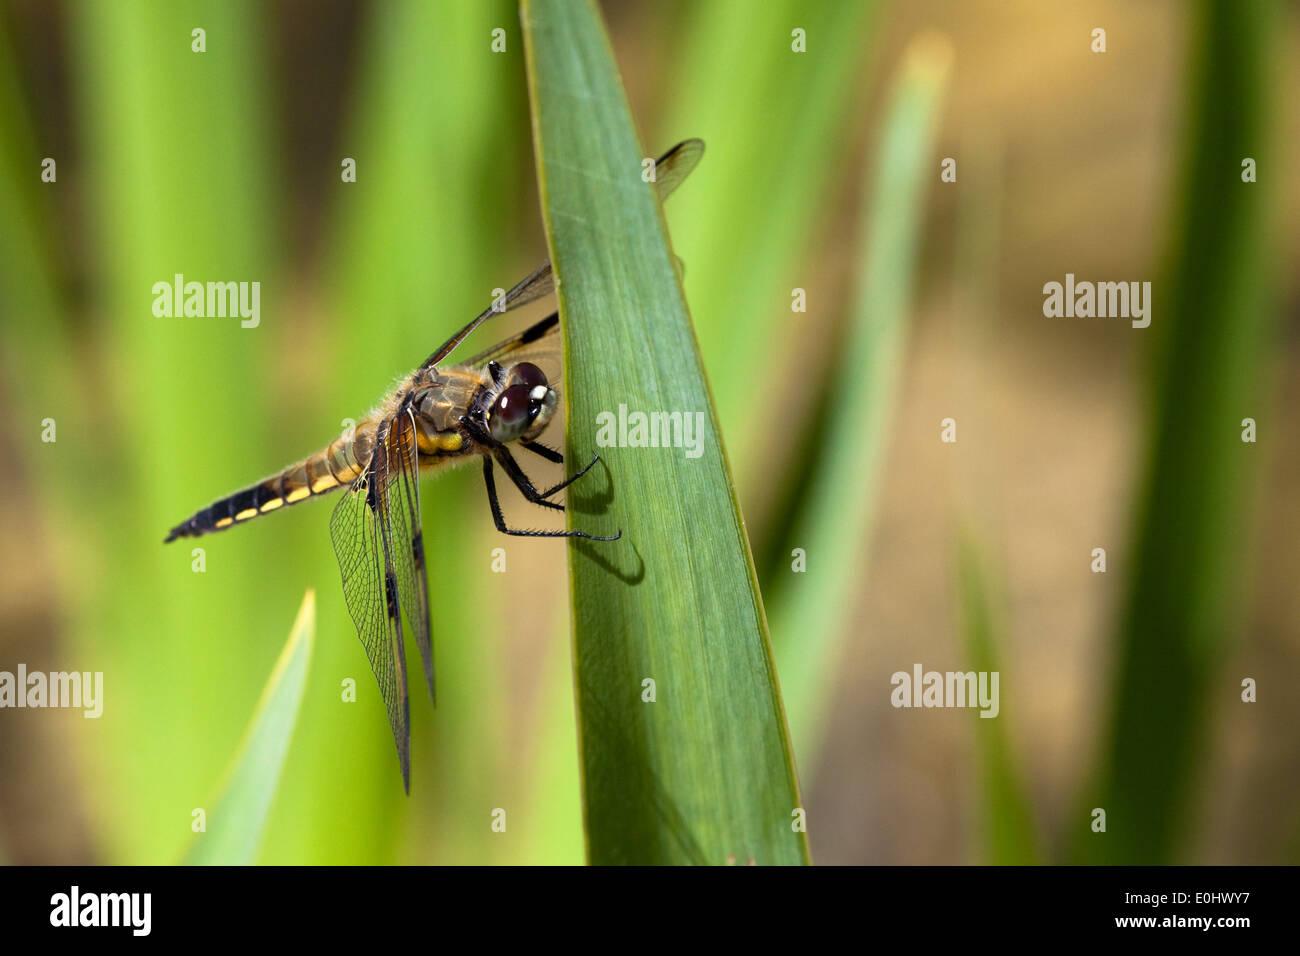 Vierfleck (Libellula quadrimaculata) - Four-spotted Chaser (Libellula quadrimaculata) - Stock Image